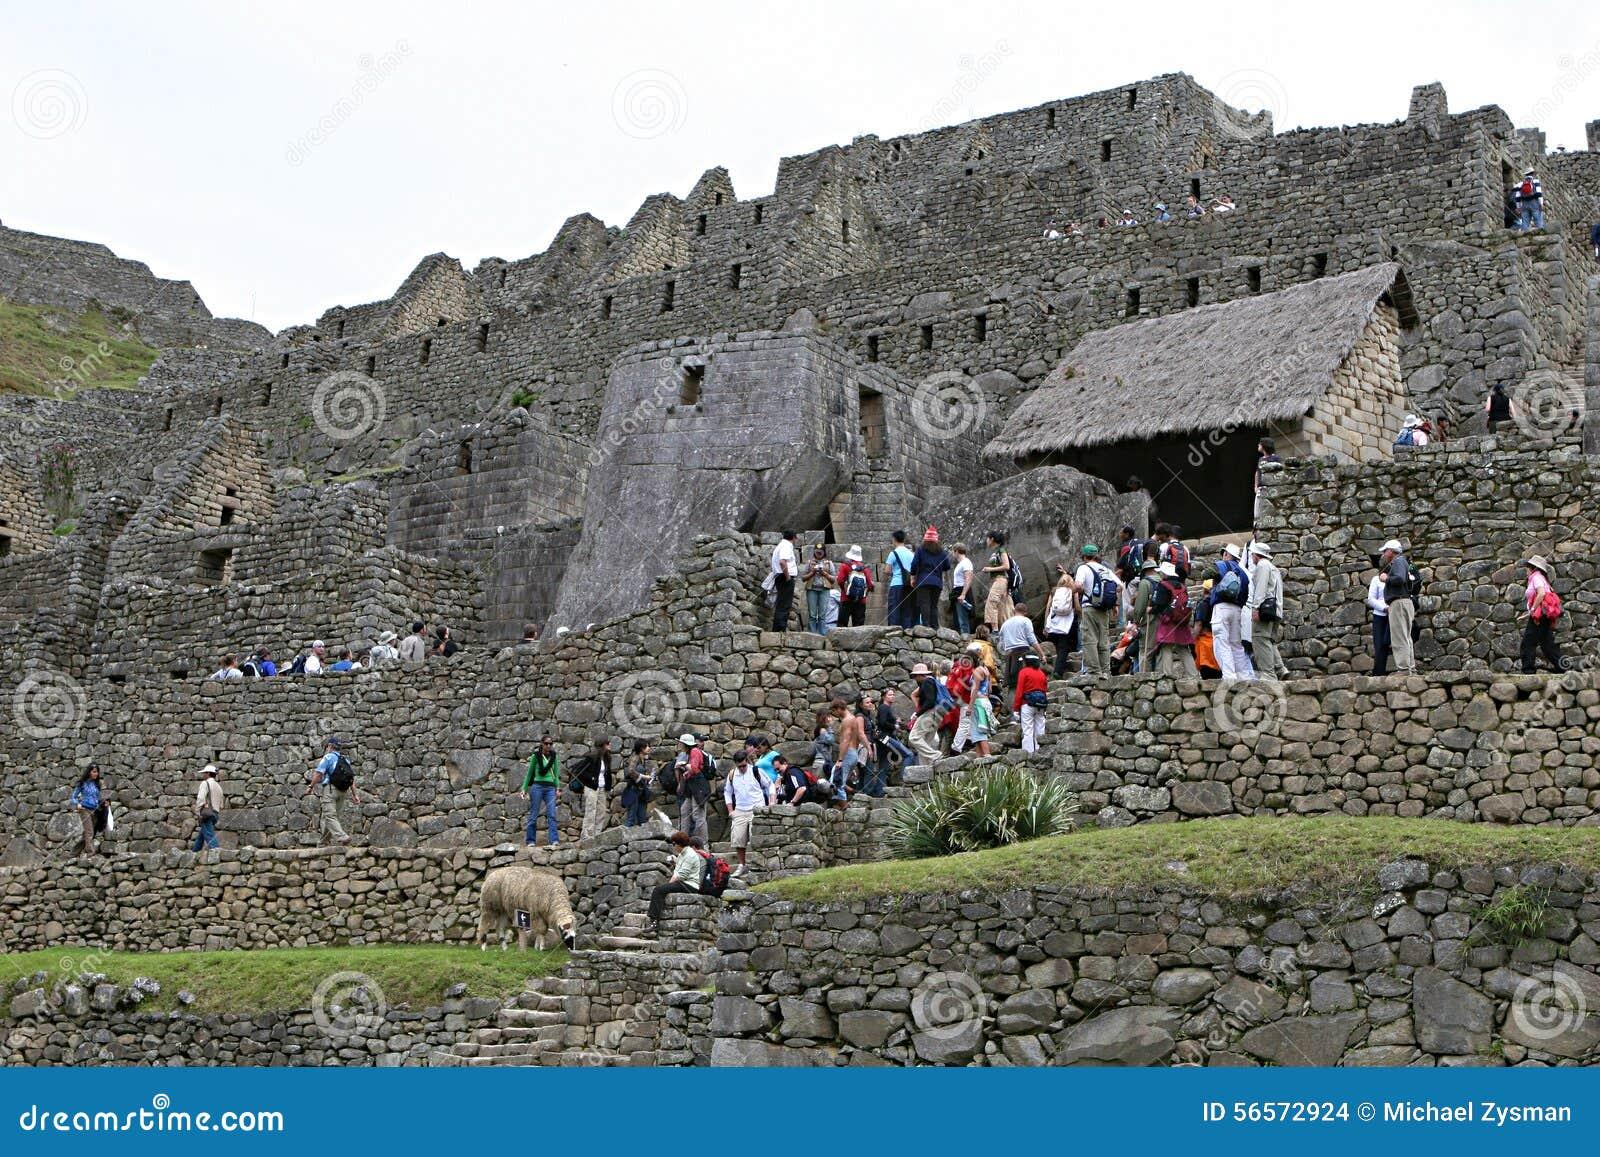 Download Τοιχοποιία Picchu Machu εκδοτική στοκ εικόνα. εικόνα από inca - 56572924